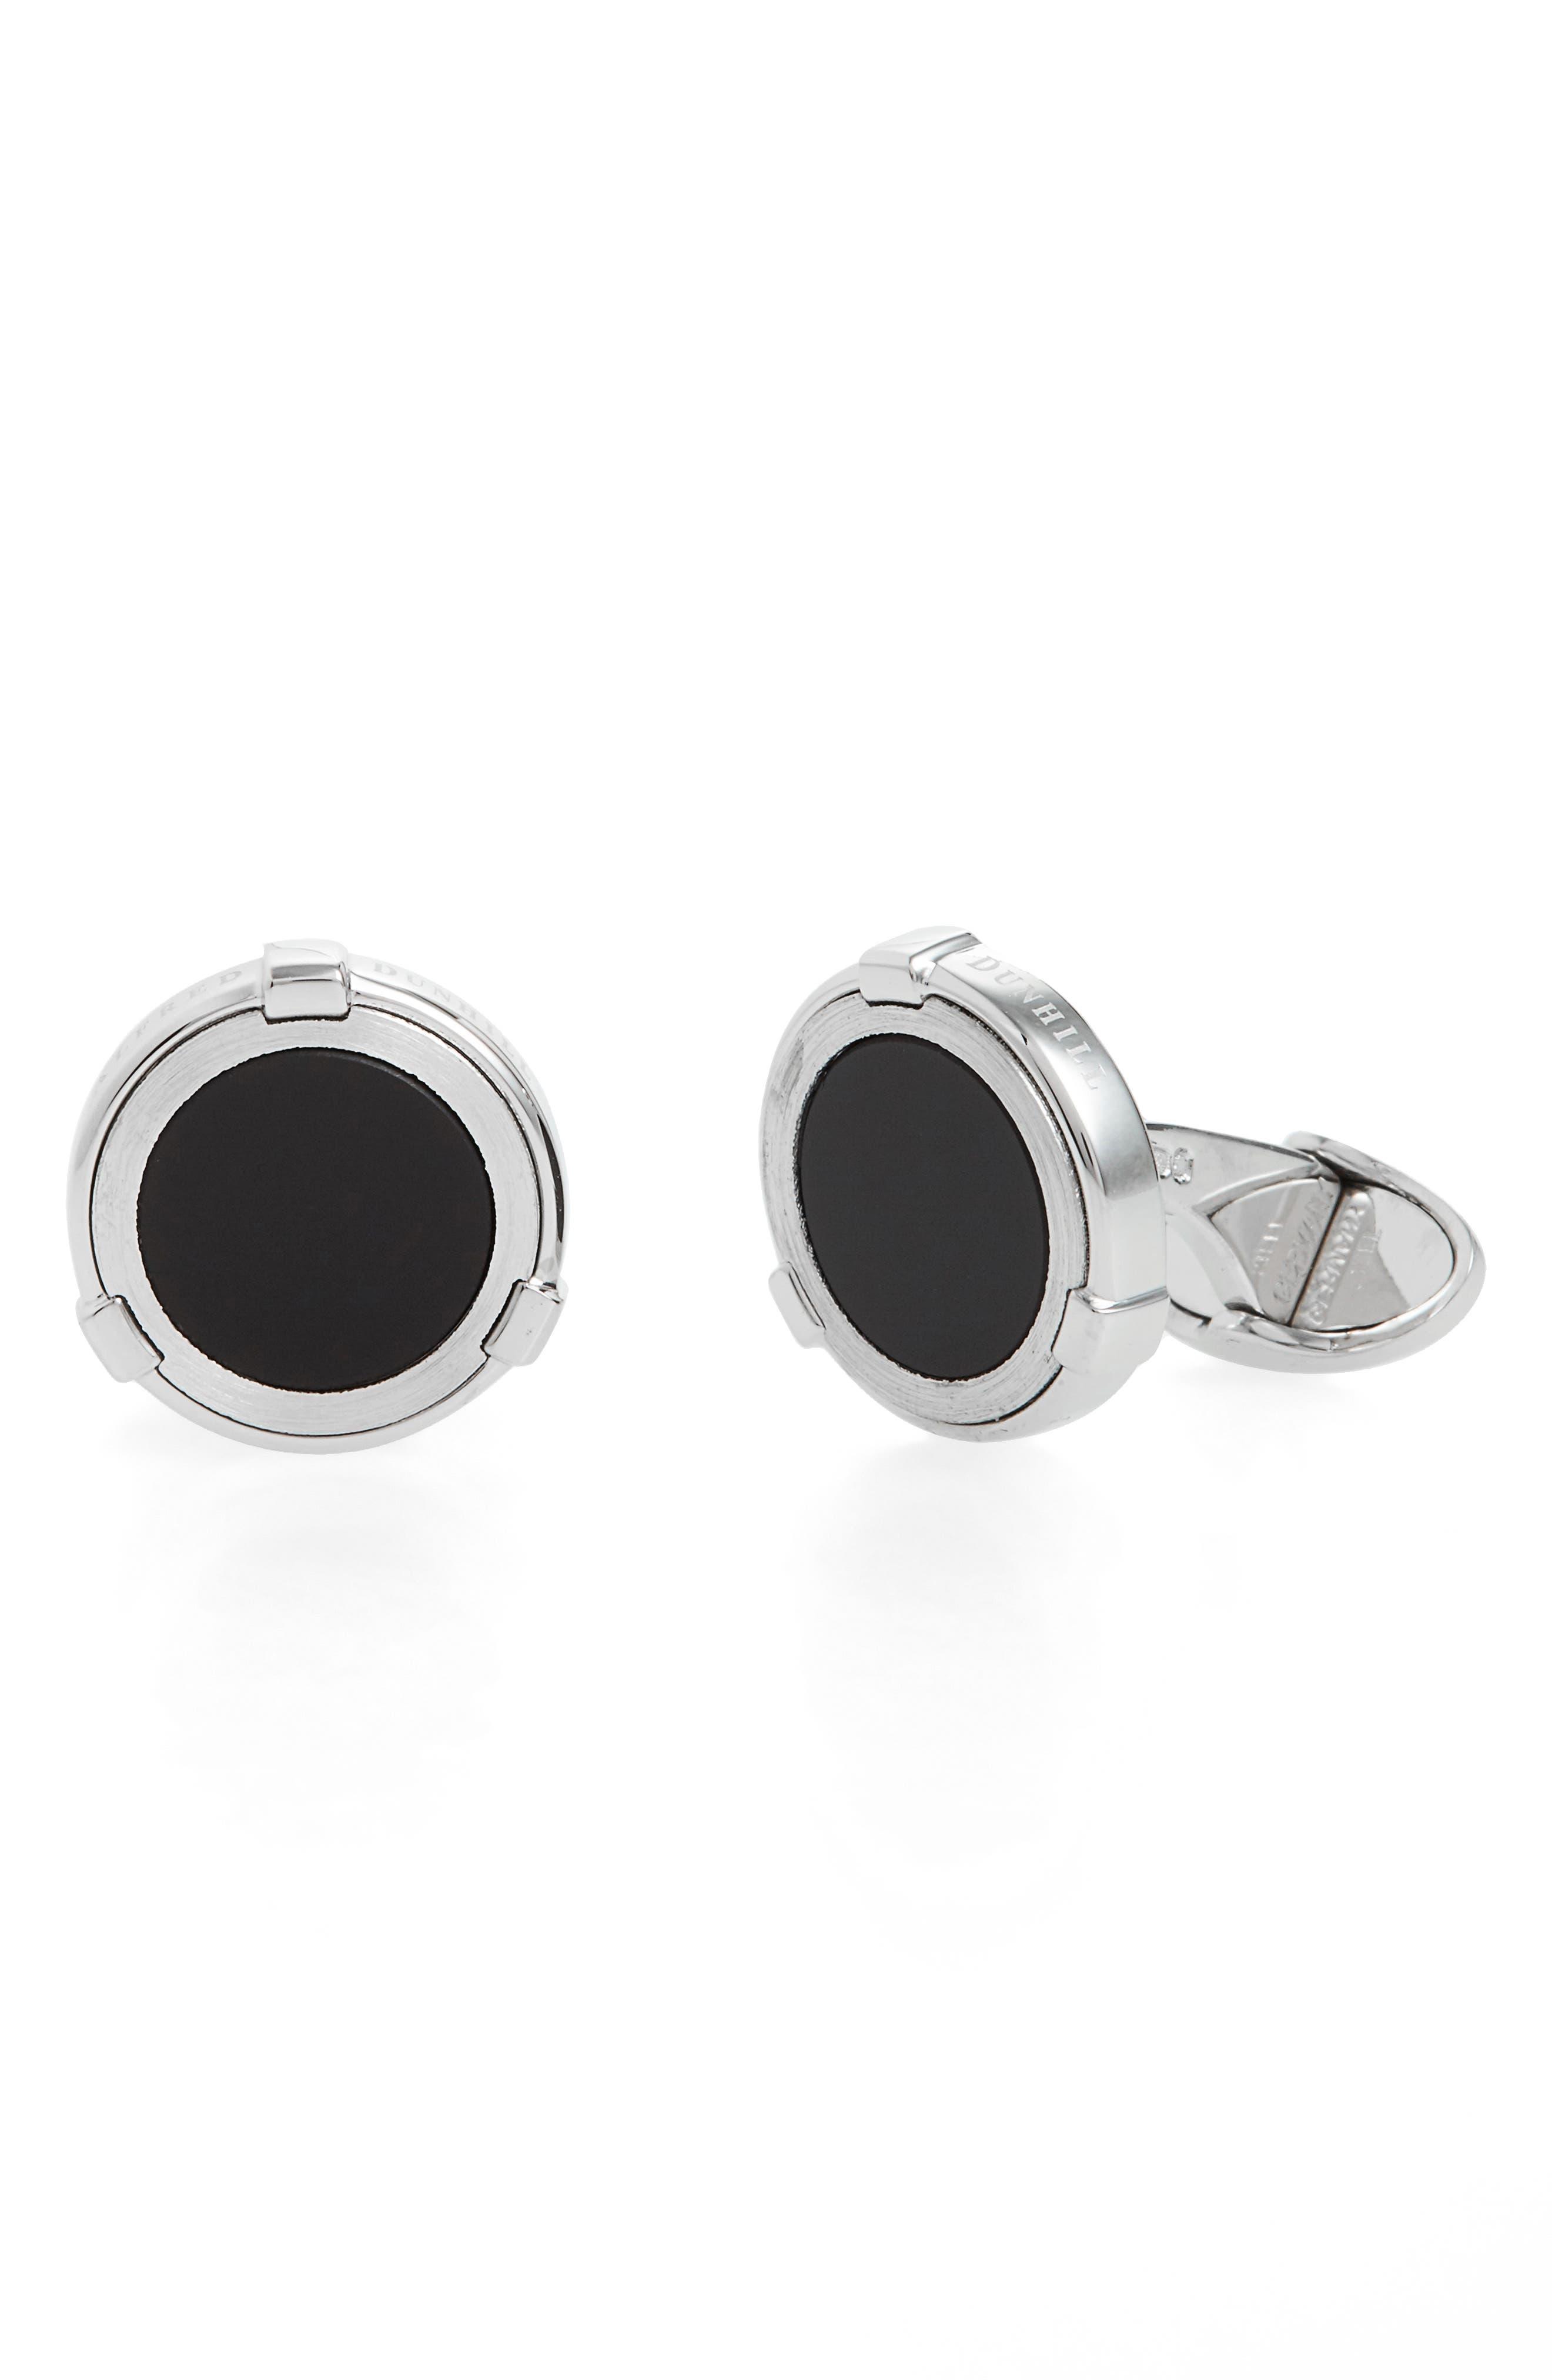 Latch Stone Cuff Links,                         Main,                         color, Onyx/Silver